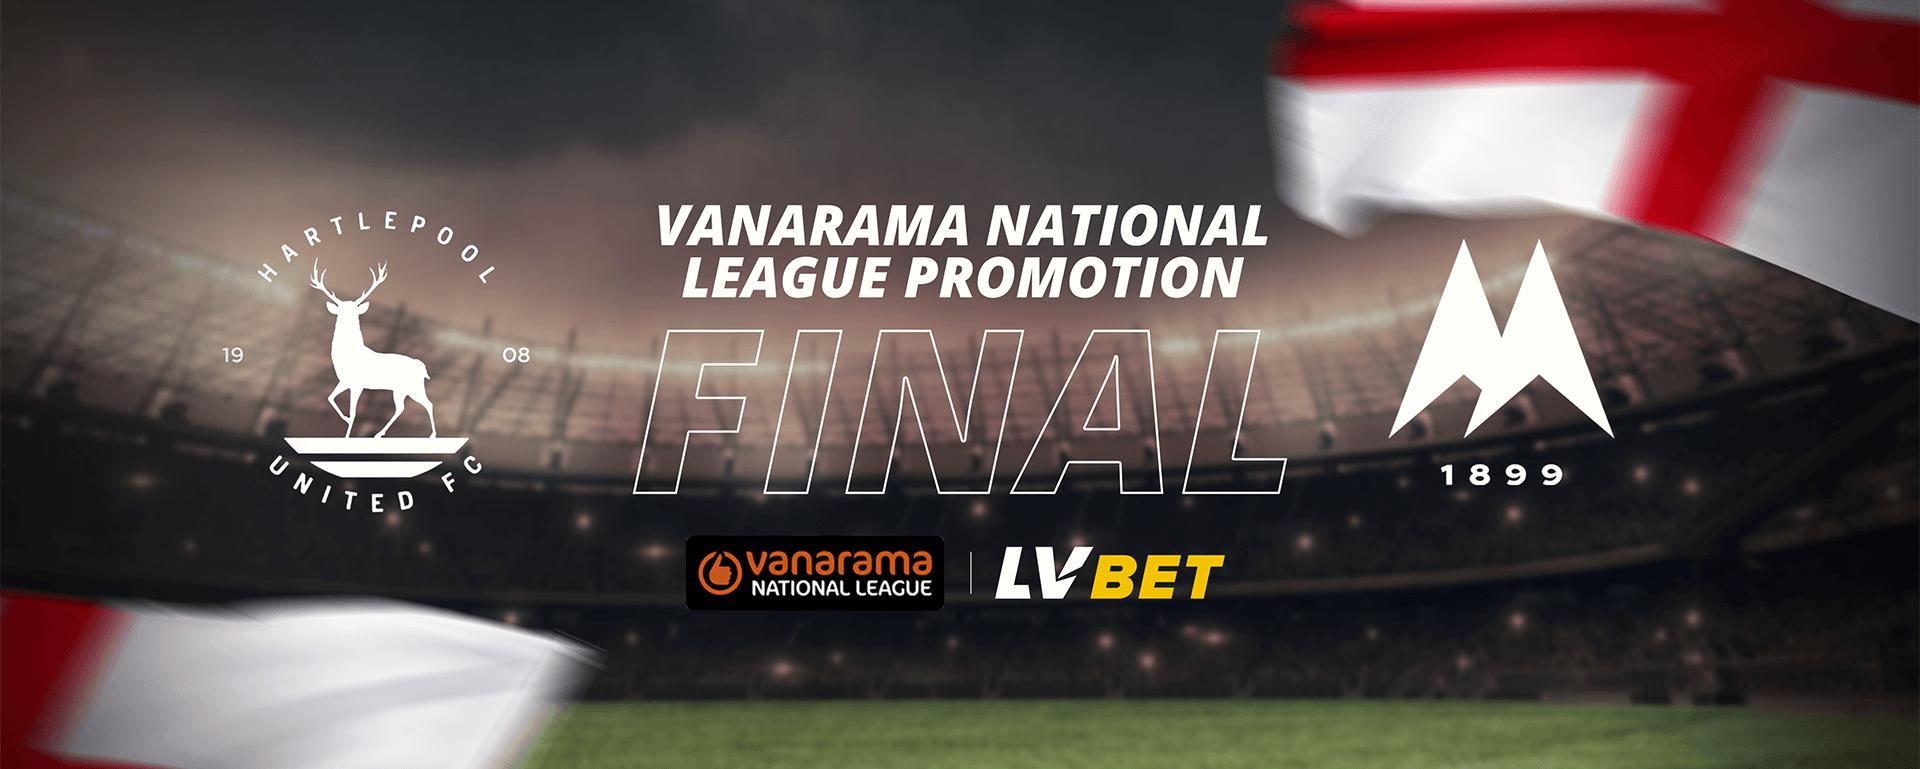 VANARAMA NATIONAL LEGUE PROMOTION FINAL: TORQUAY UNITED VS HARTLEPOOL UNITED